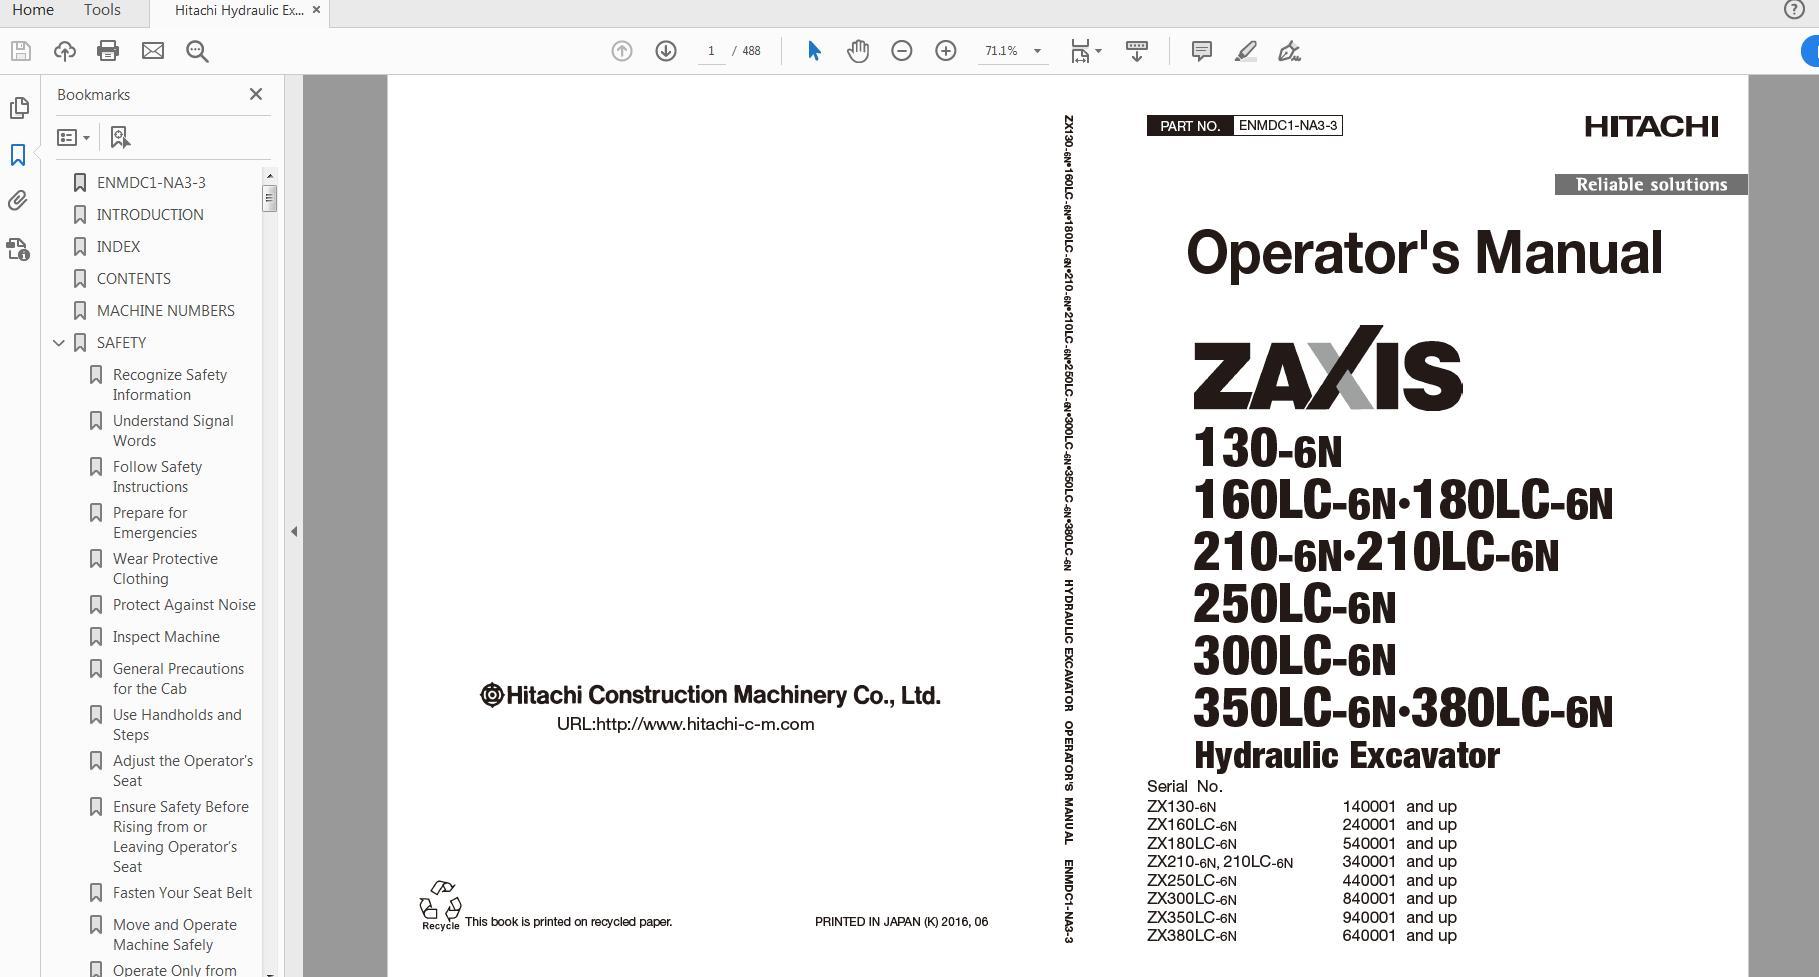 Hitachi Hydraulic Excavator ZX80-GI TODEK-EN-00 Technical